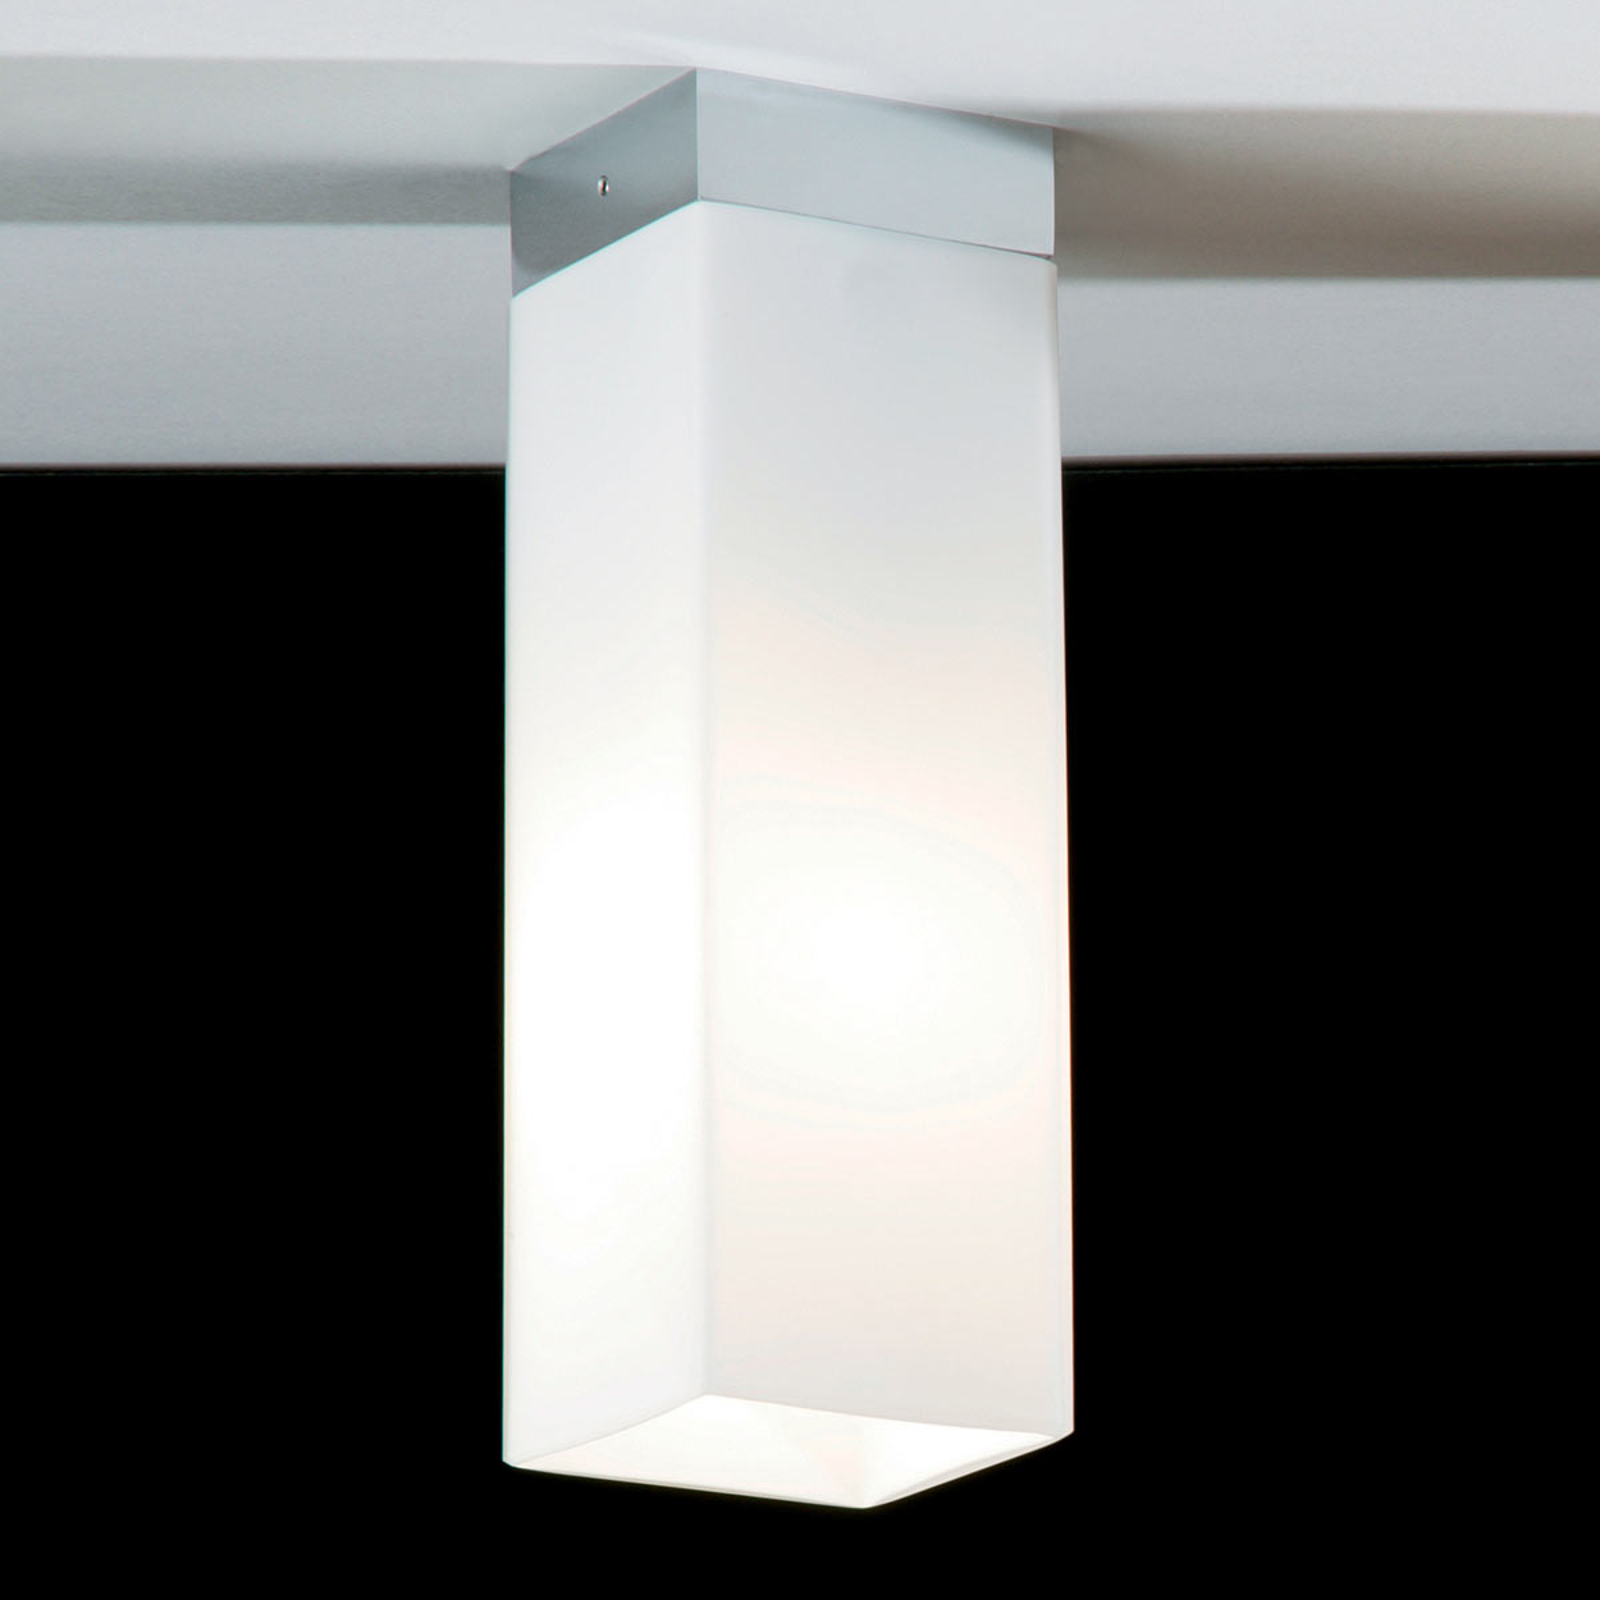 Lampa sufitowa QUADRO BOX ze szkła, nikiel mat